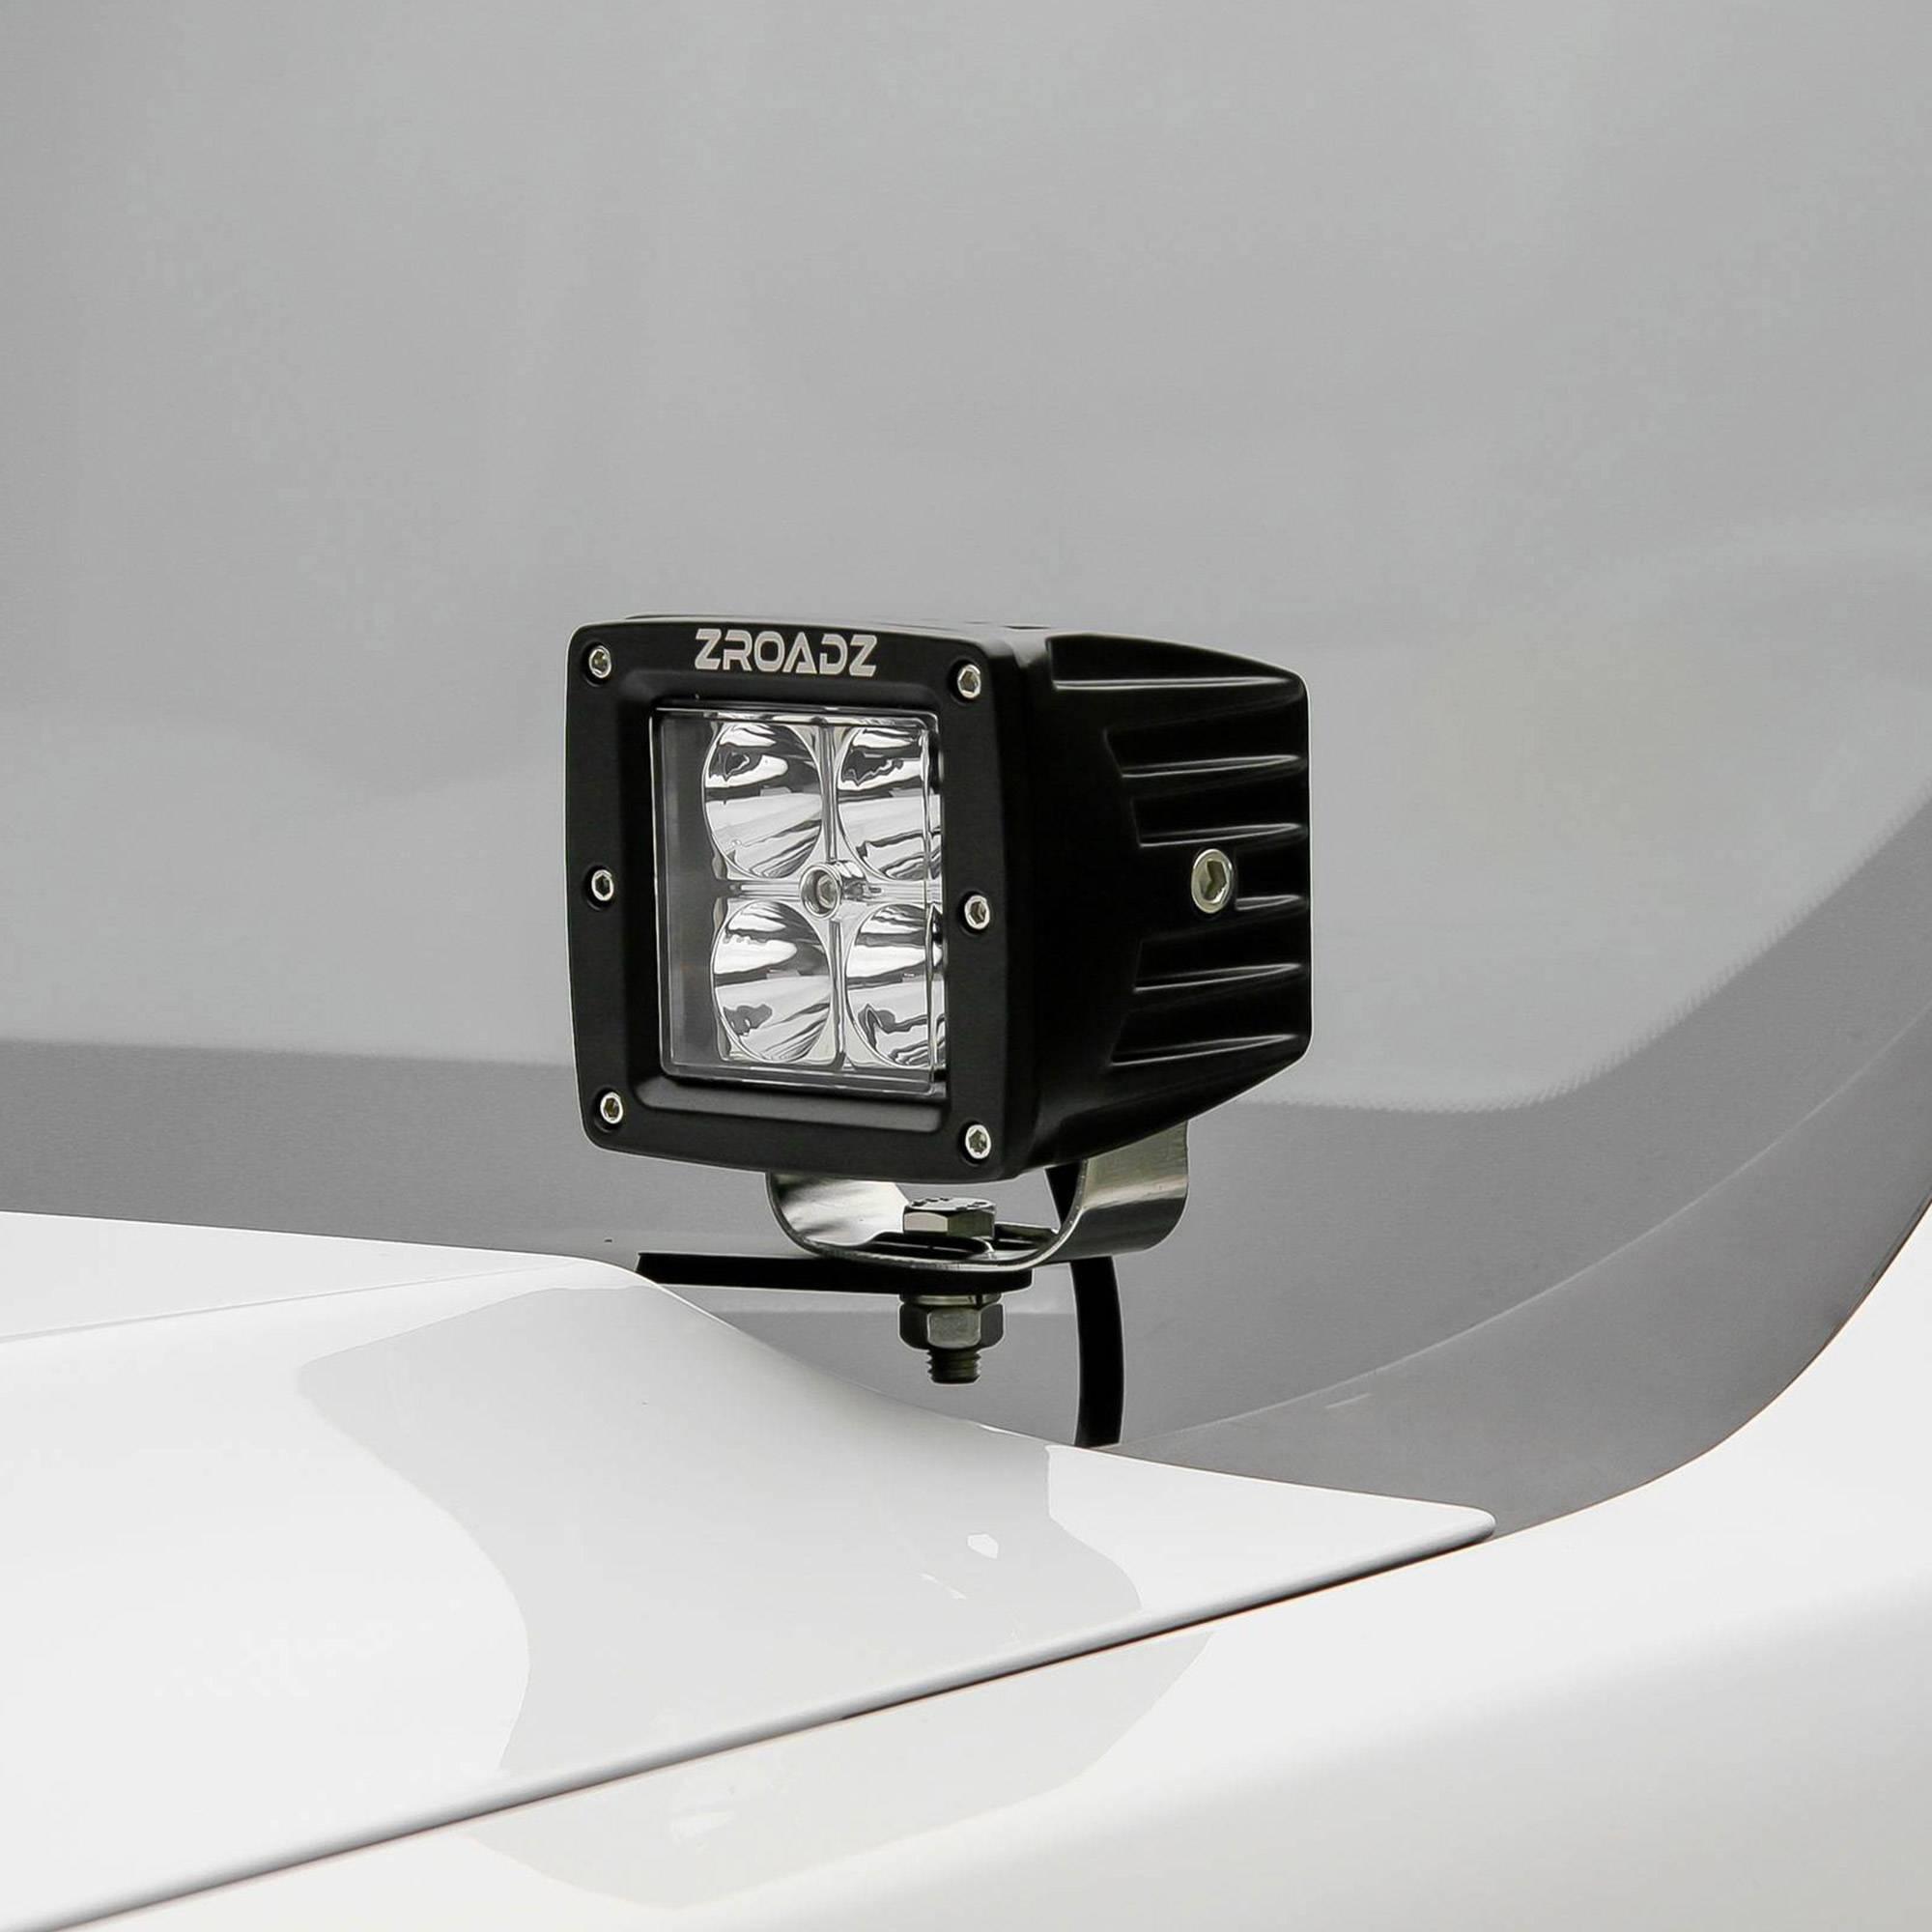 ZROADZ                                             - 2008-2010 Ford Super Duty Hood Hinge LED Kit with (2) 3 Inch LED Pod Lights - PN #Z365631-KIT2